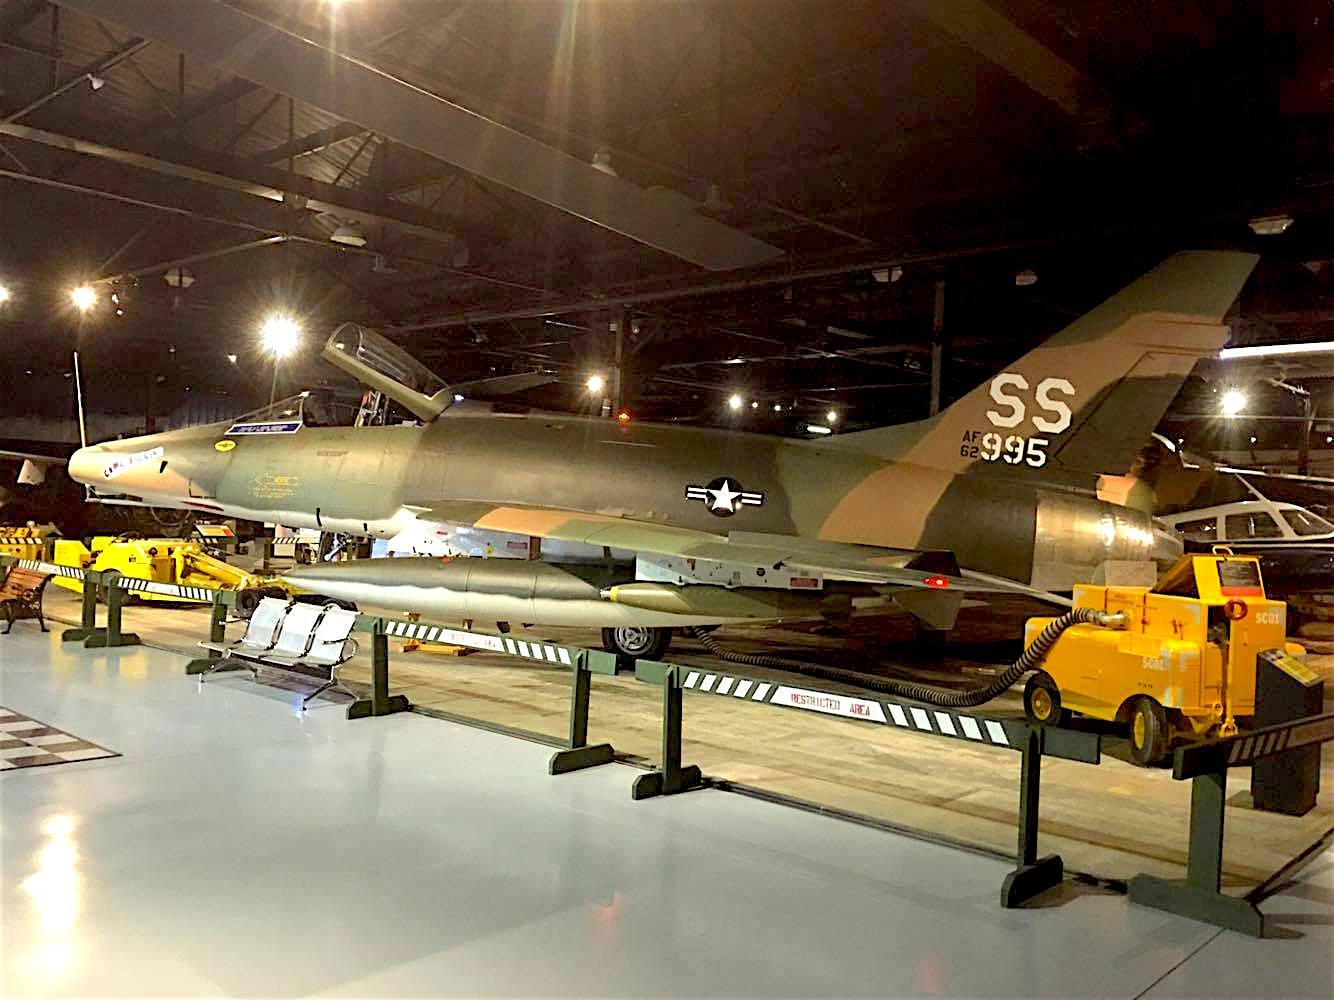 Museum of Aviation F-100 Super Sabre